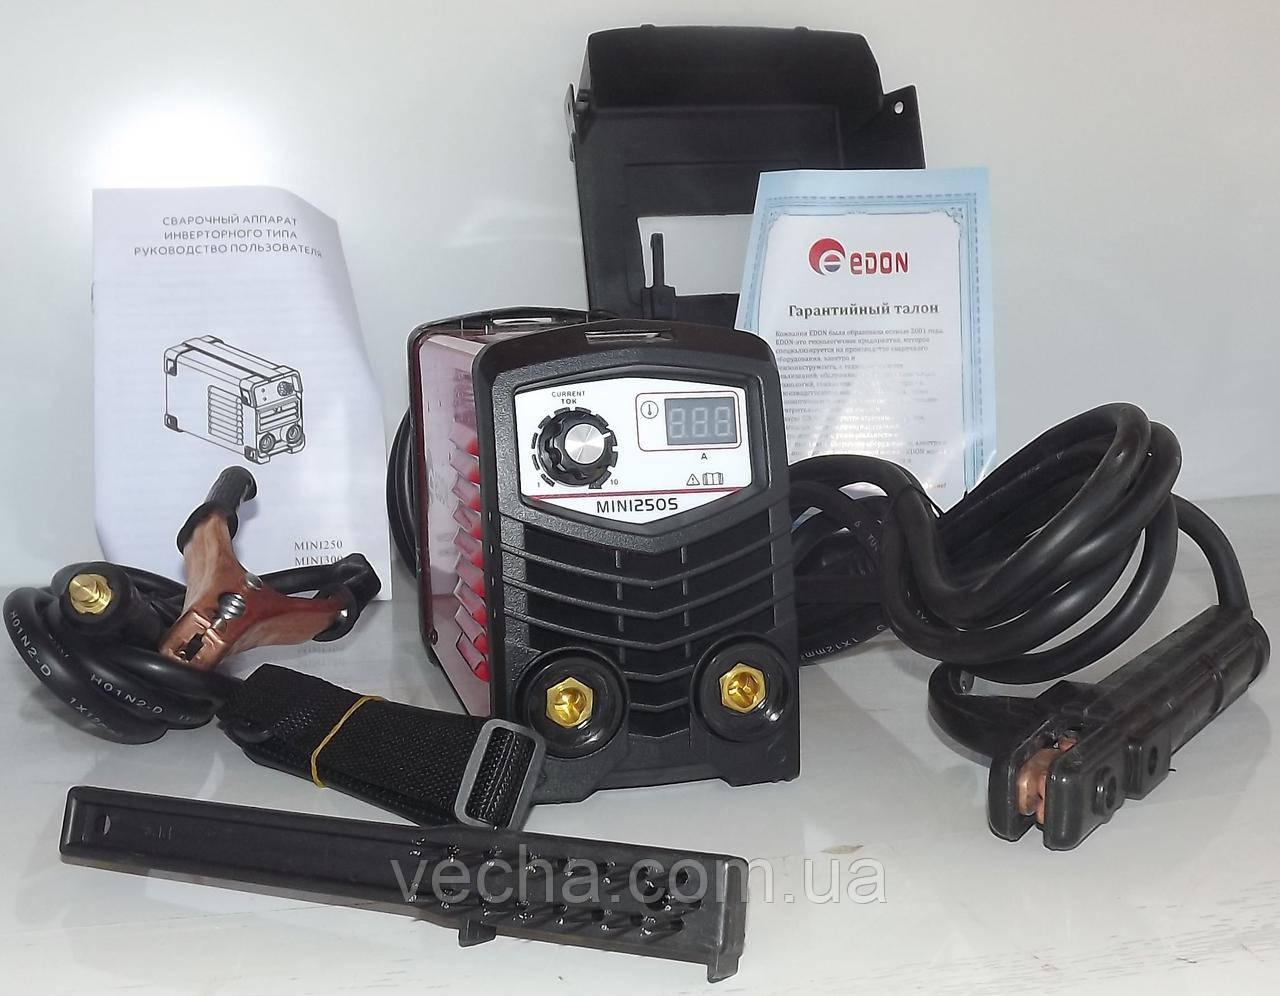 Сварочный инвертор Edon MINI-250S (7.2 кВт, мален. размер и вес)